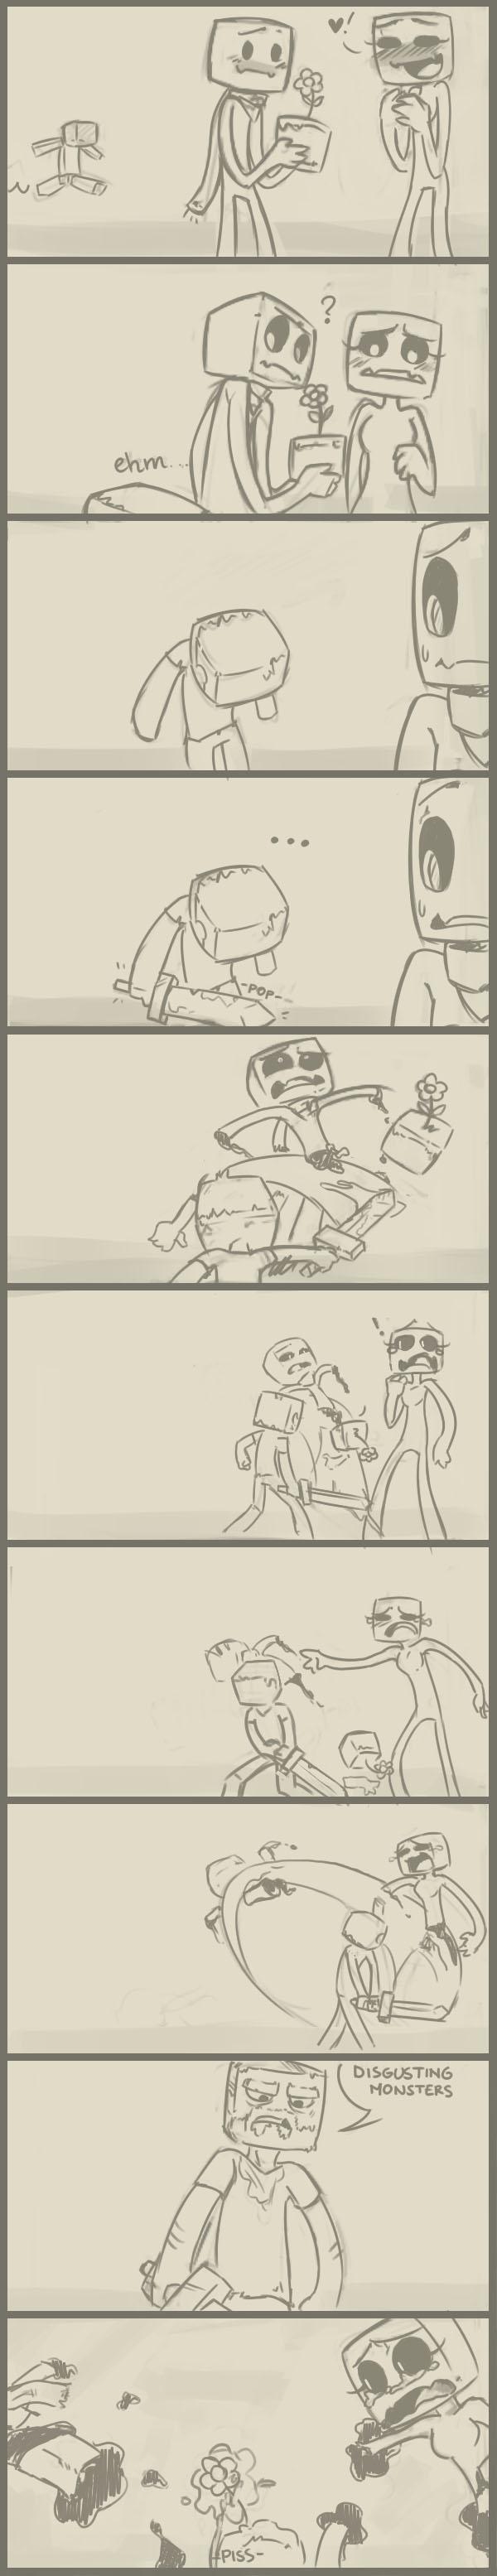 Humanity-Minecraft.jpg